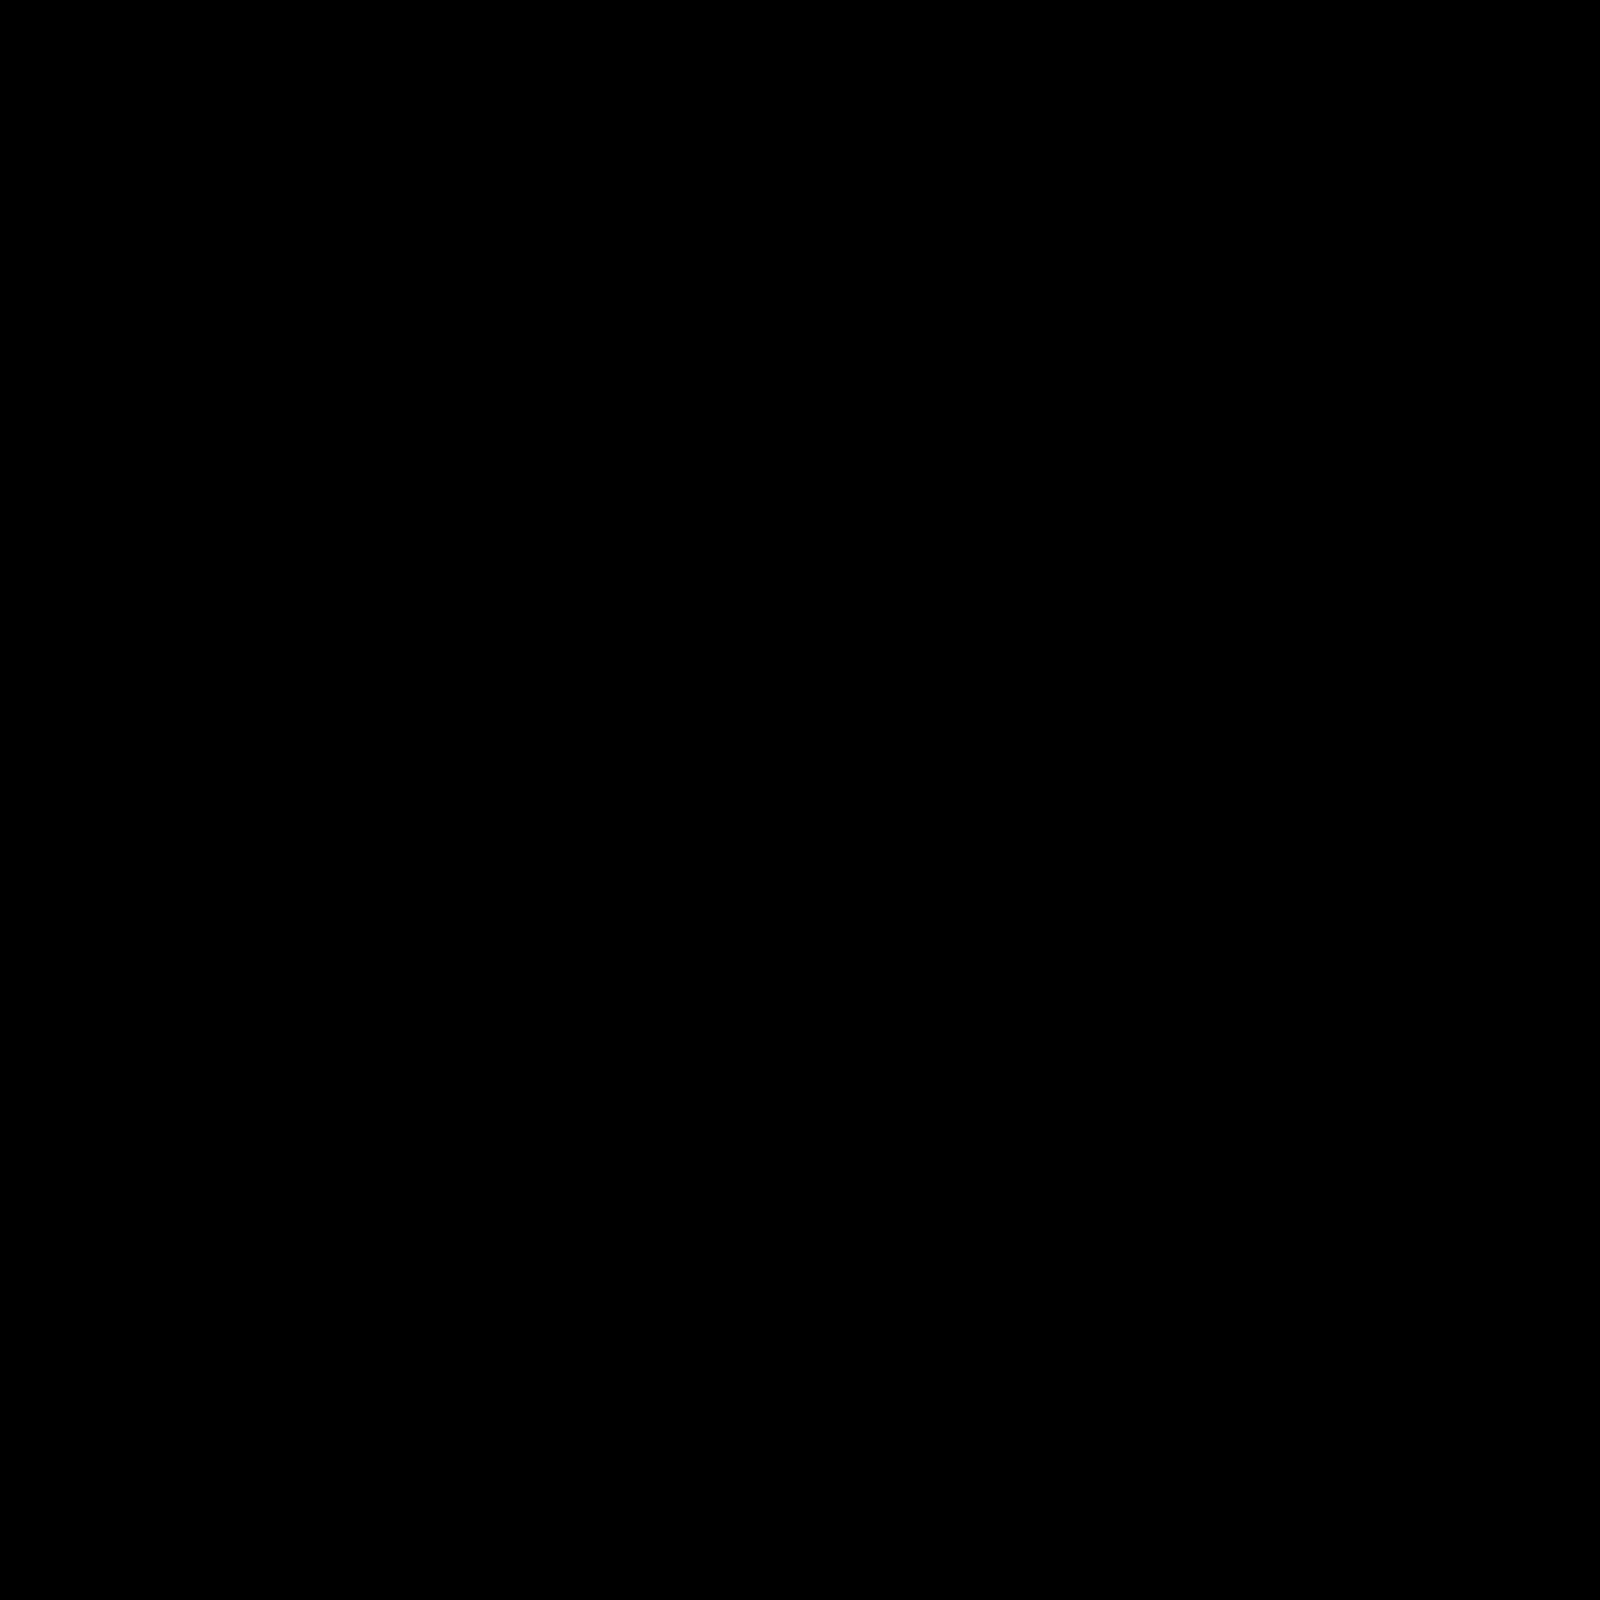 Ханука PNG